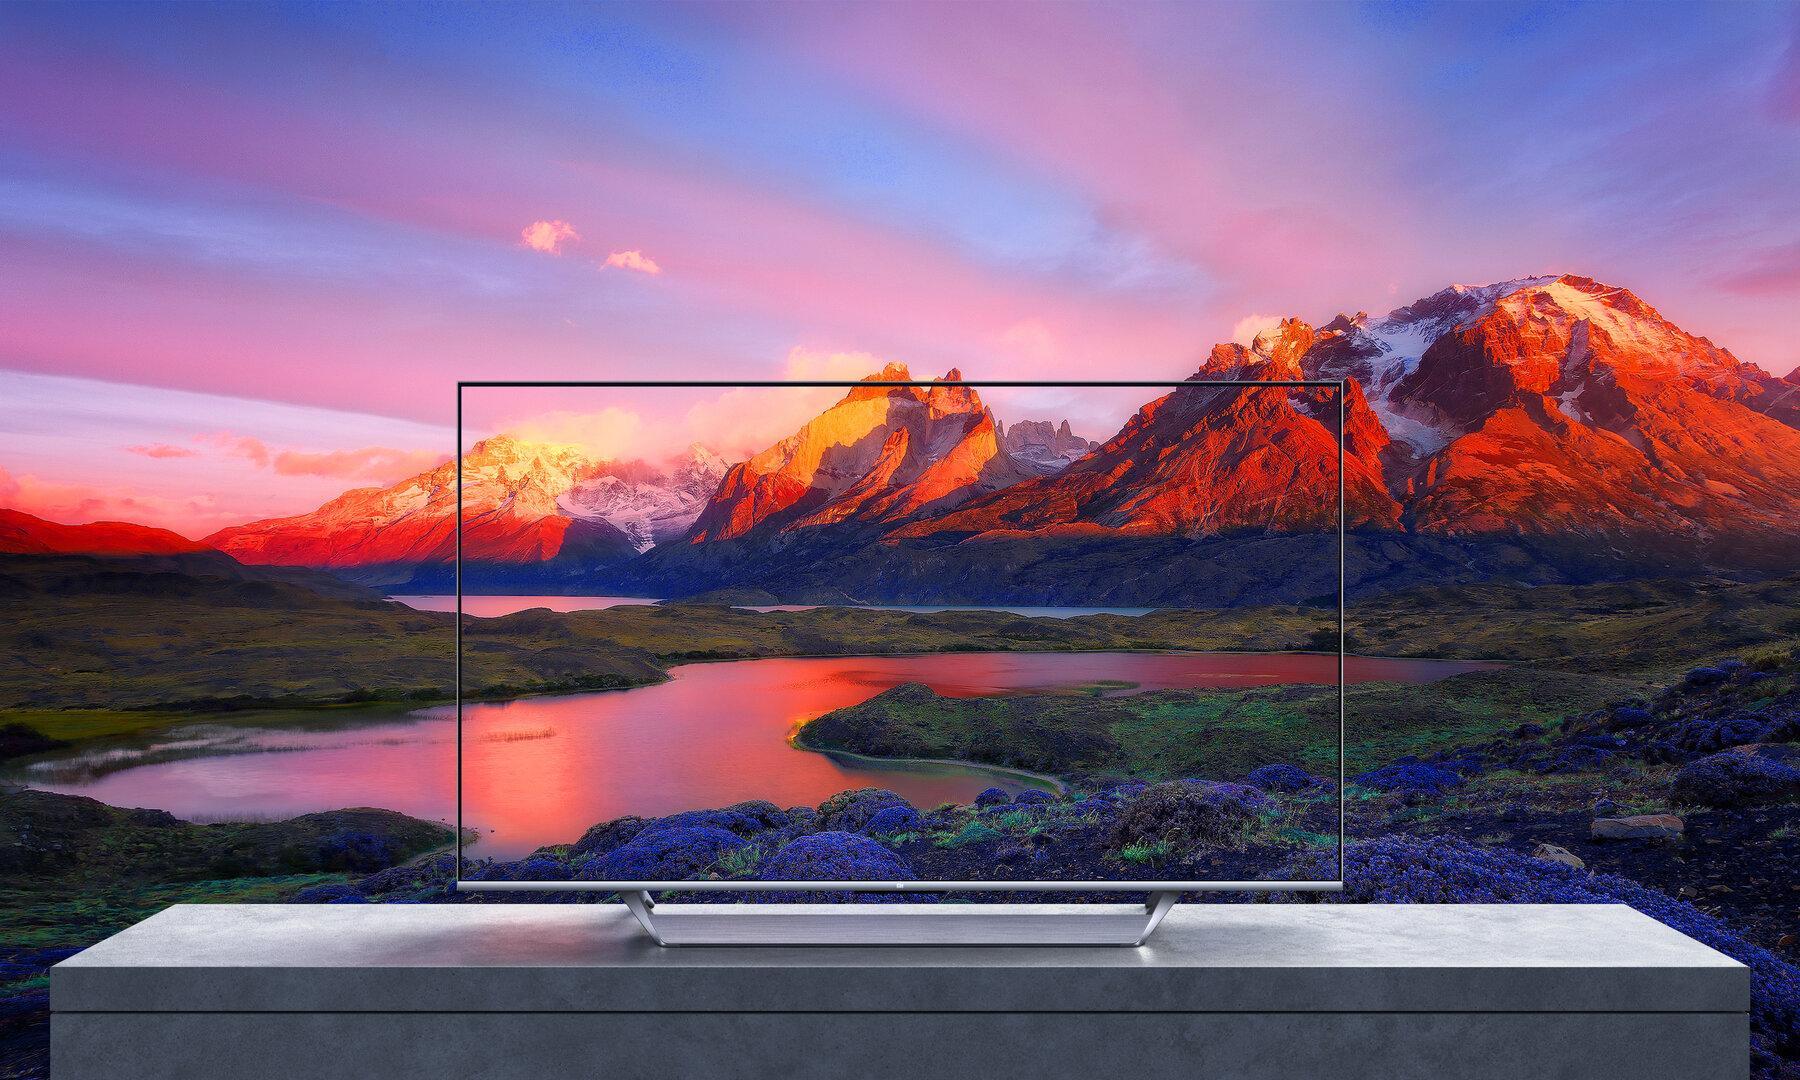 Xiaomi Mi Q1 Tv 4k 120hz Qled Hdmi 2.1 Landscape